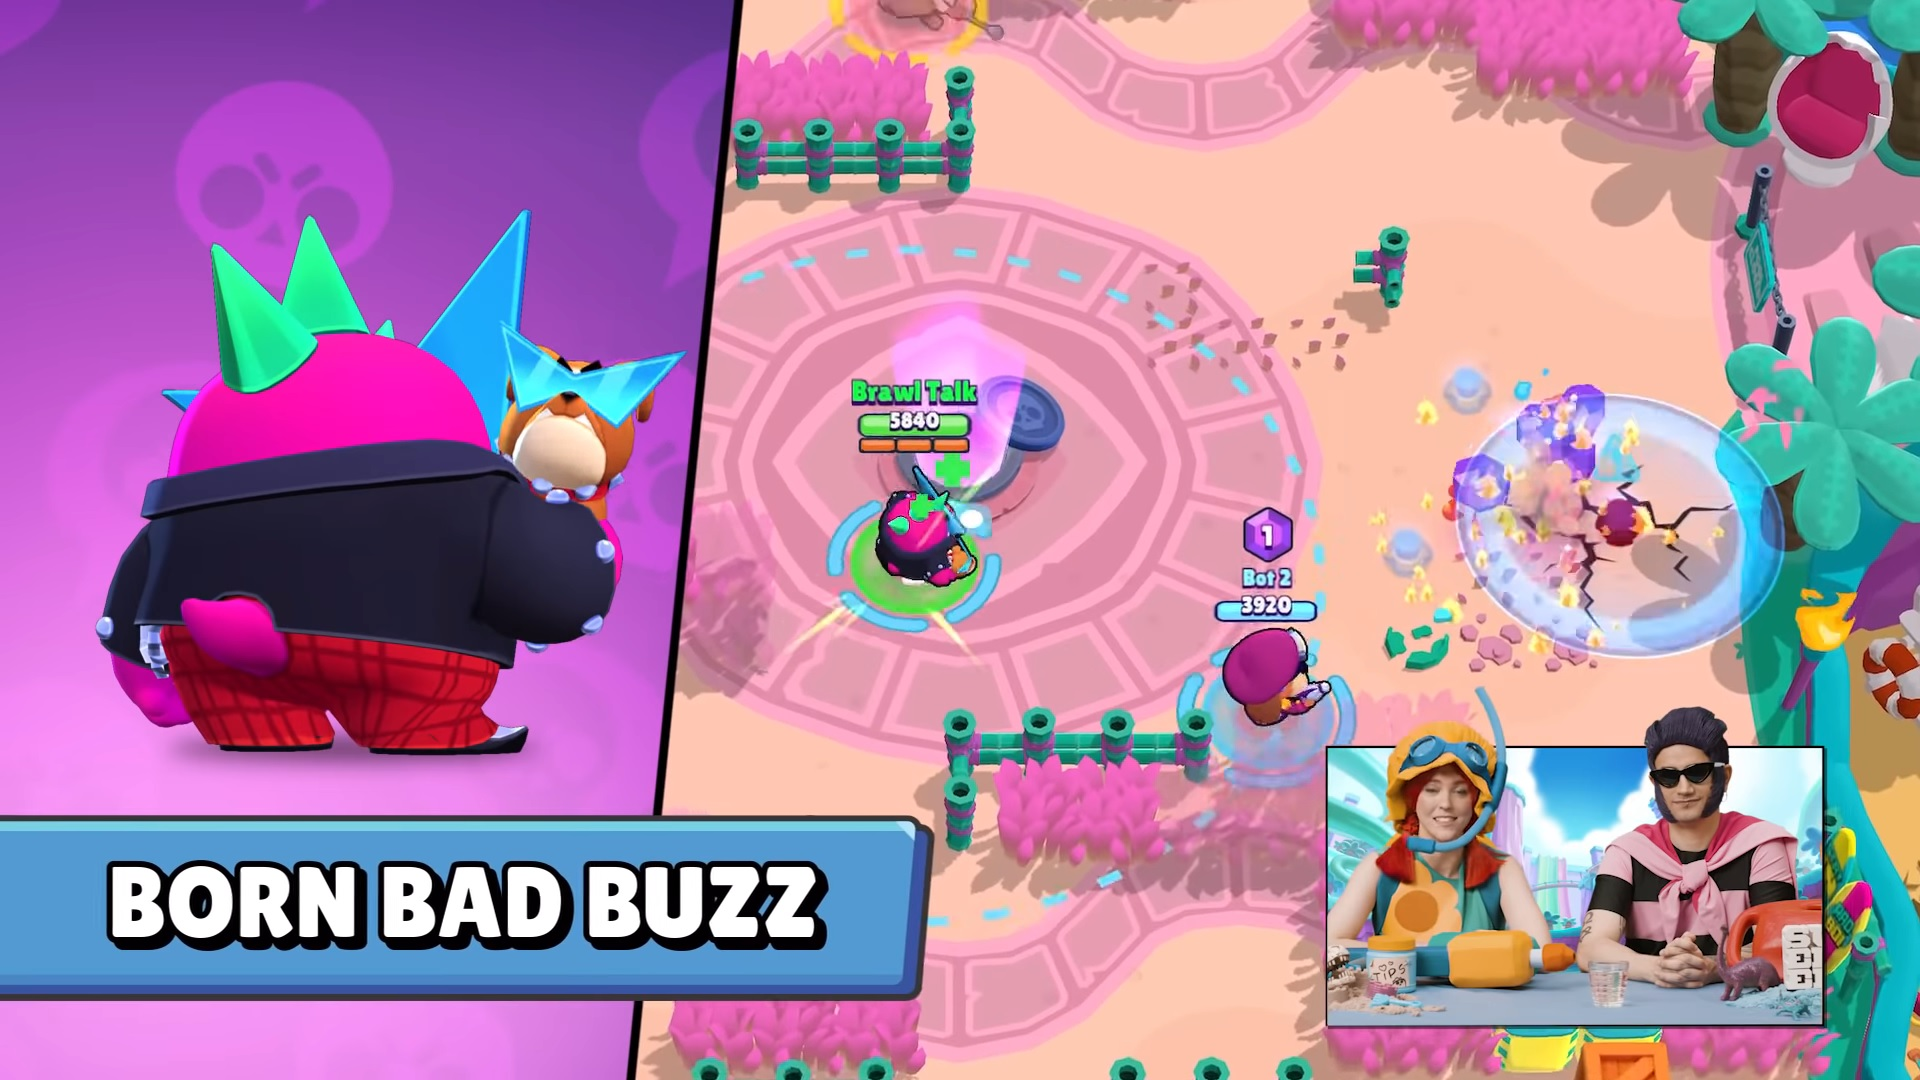 La skin alternativa de Buzz